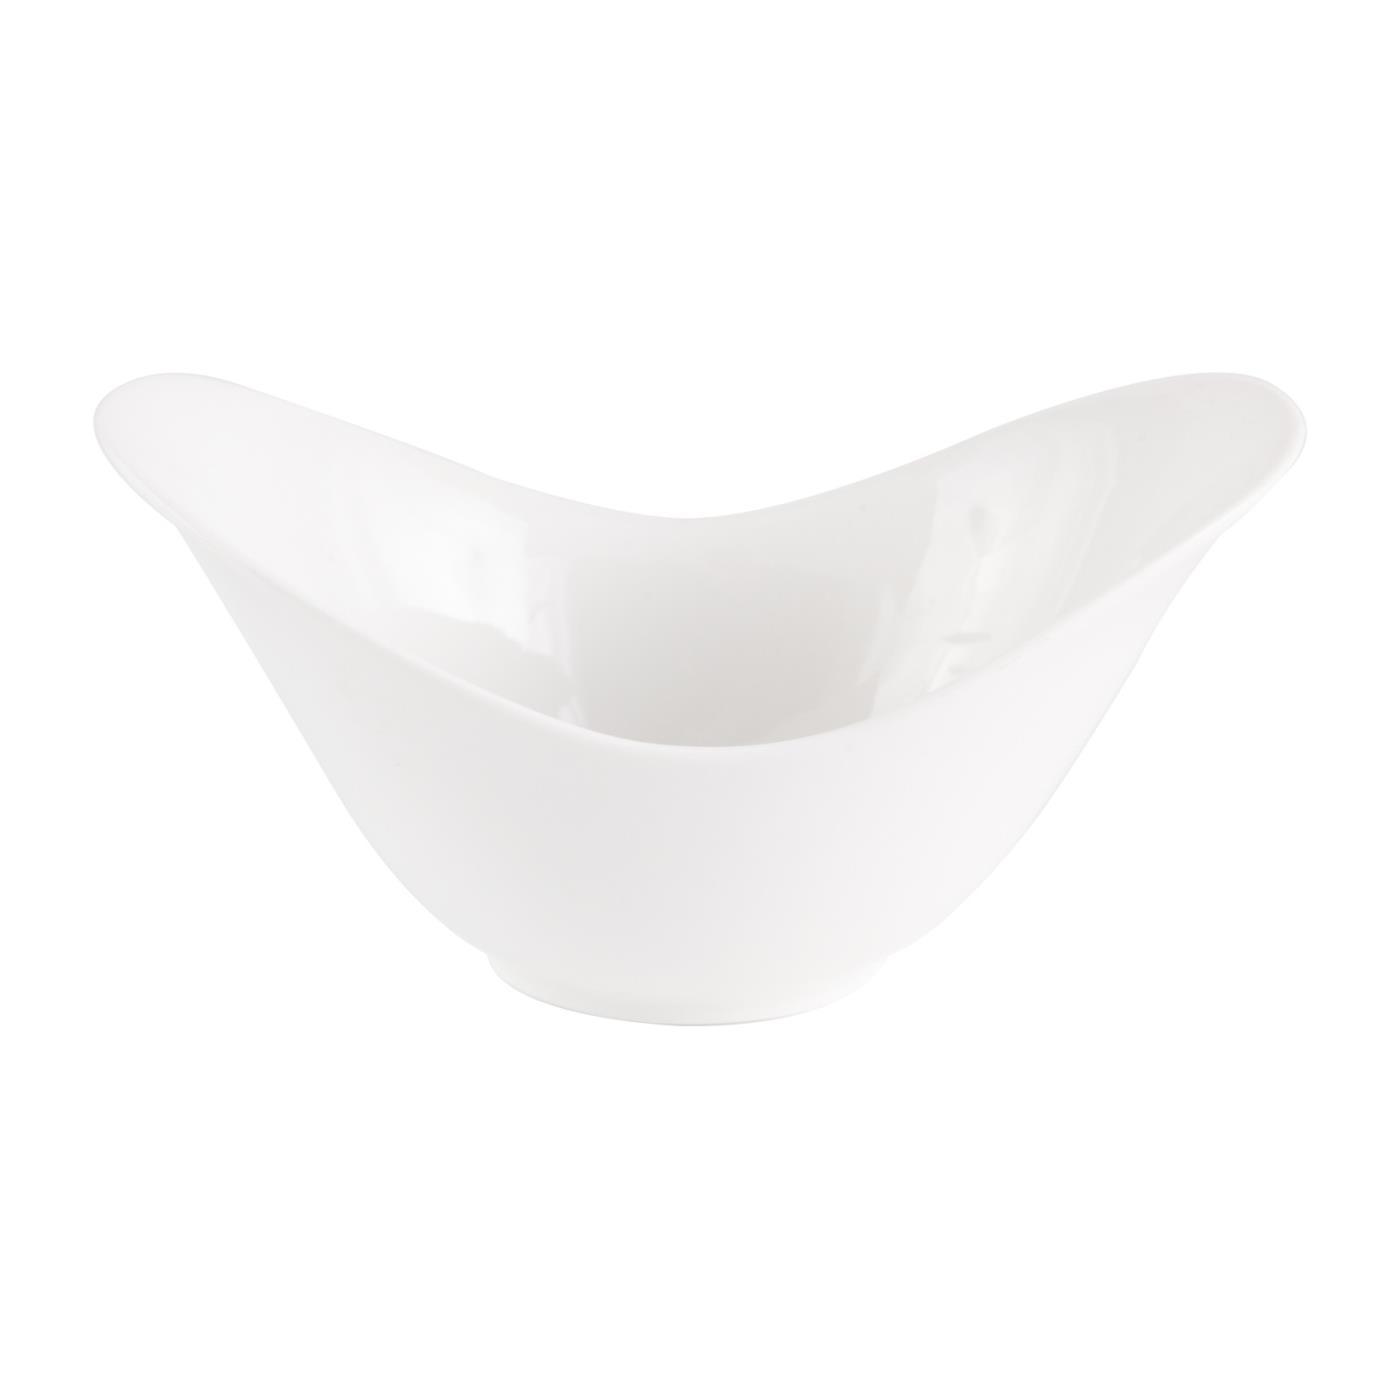 "White Ceramic Spirit Bowl - 8.5"""